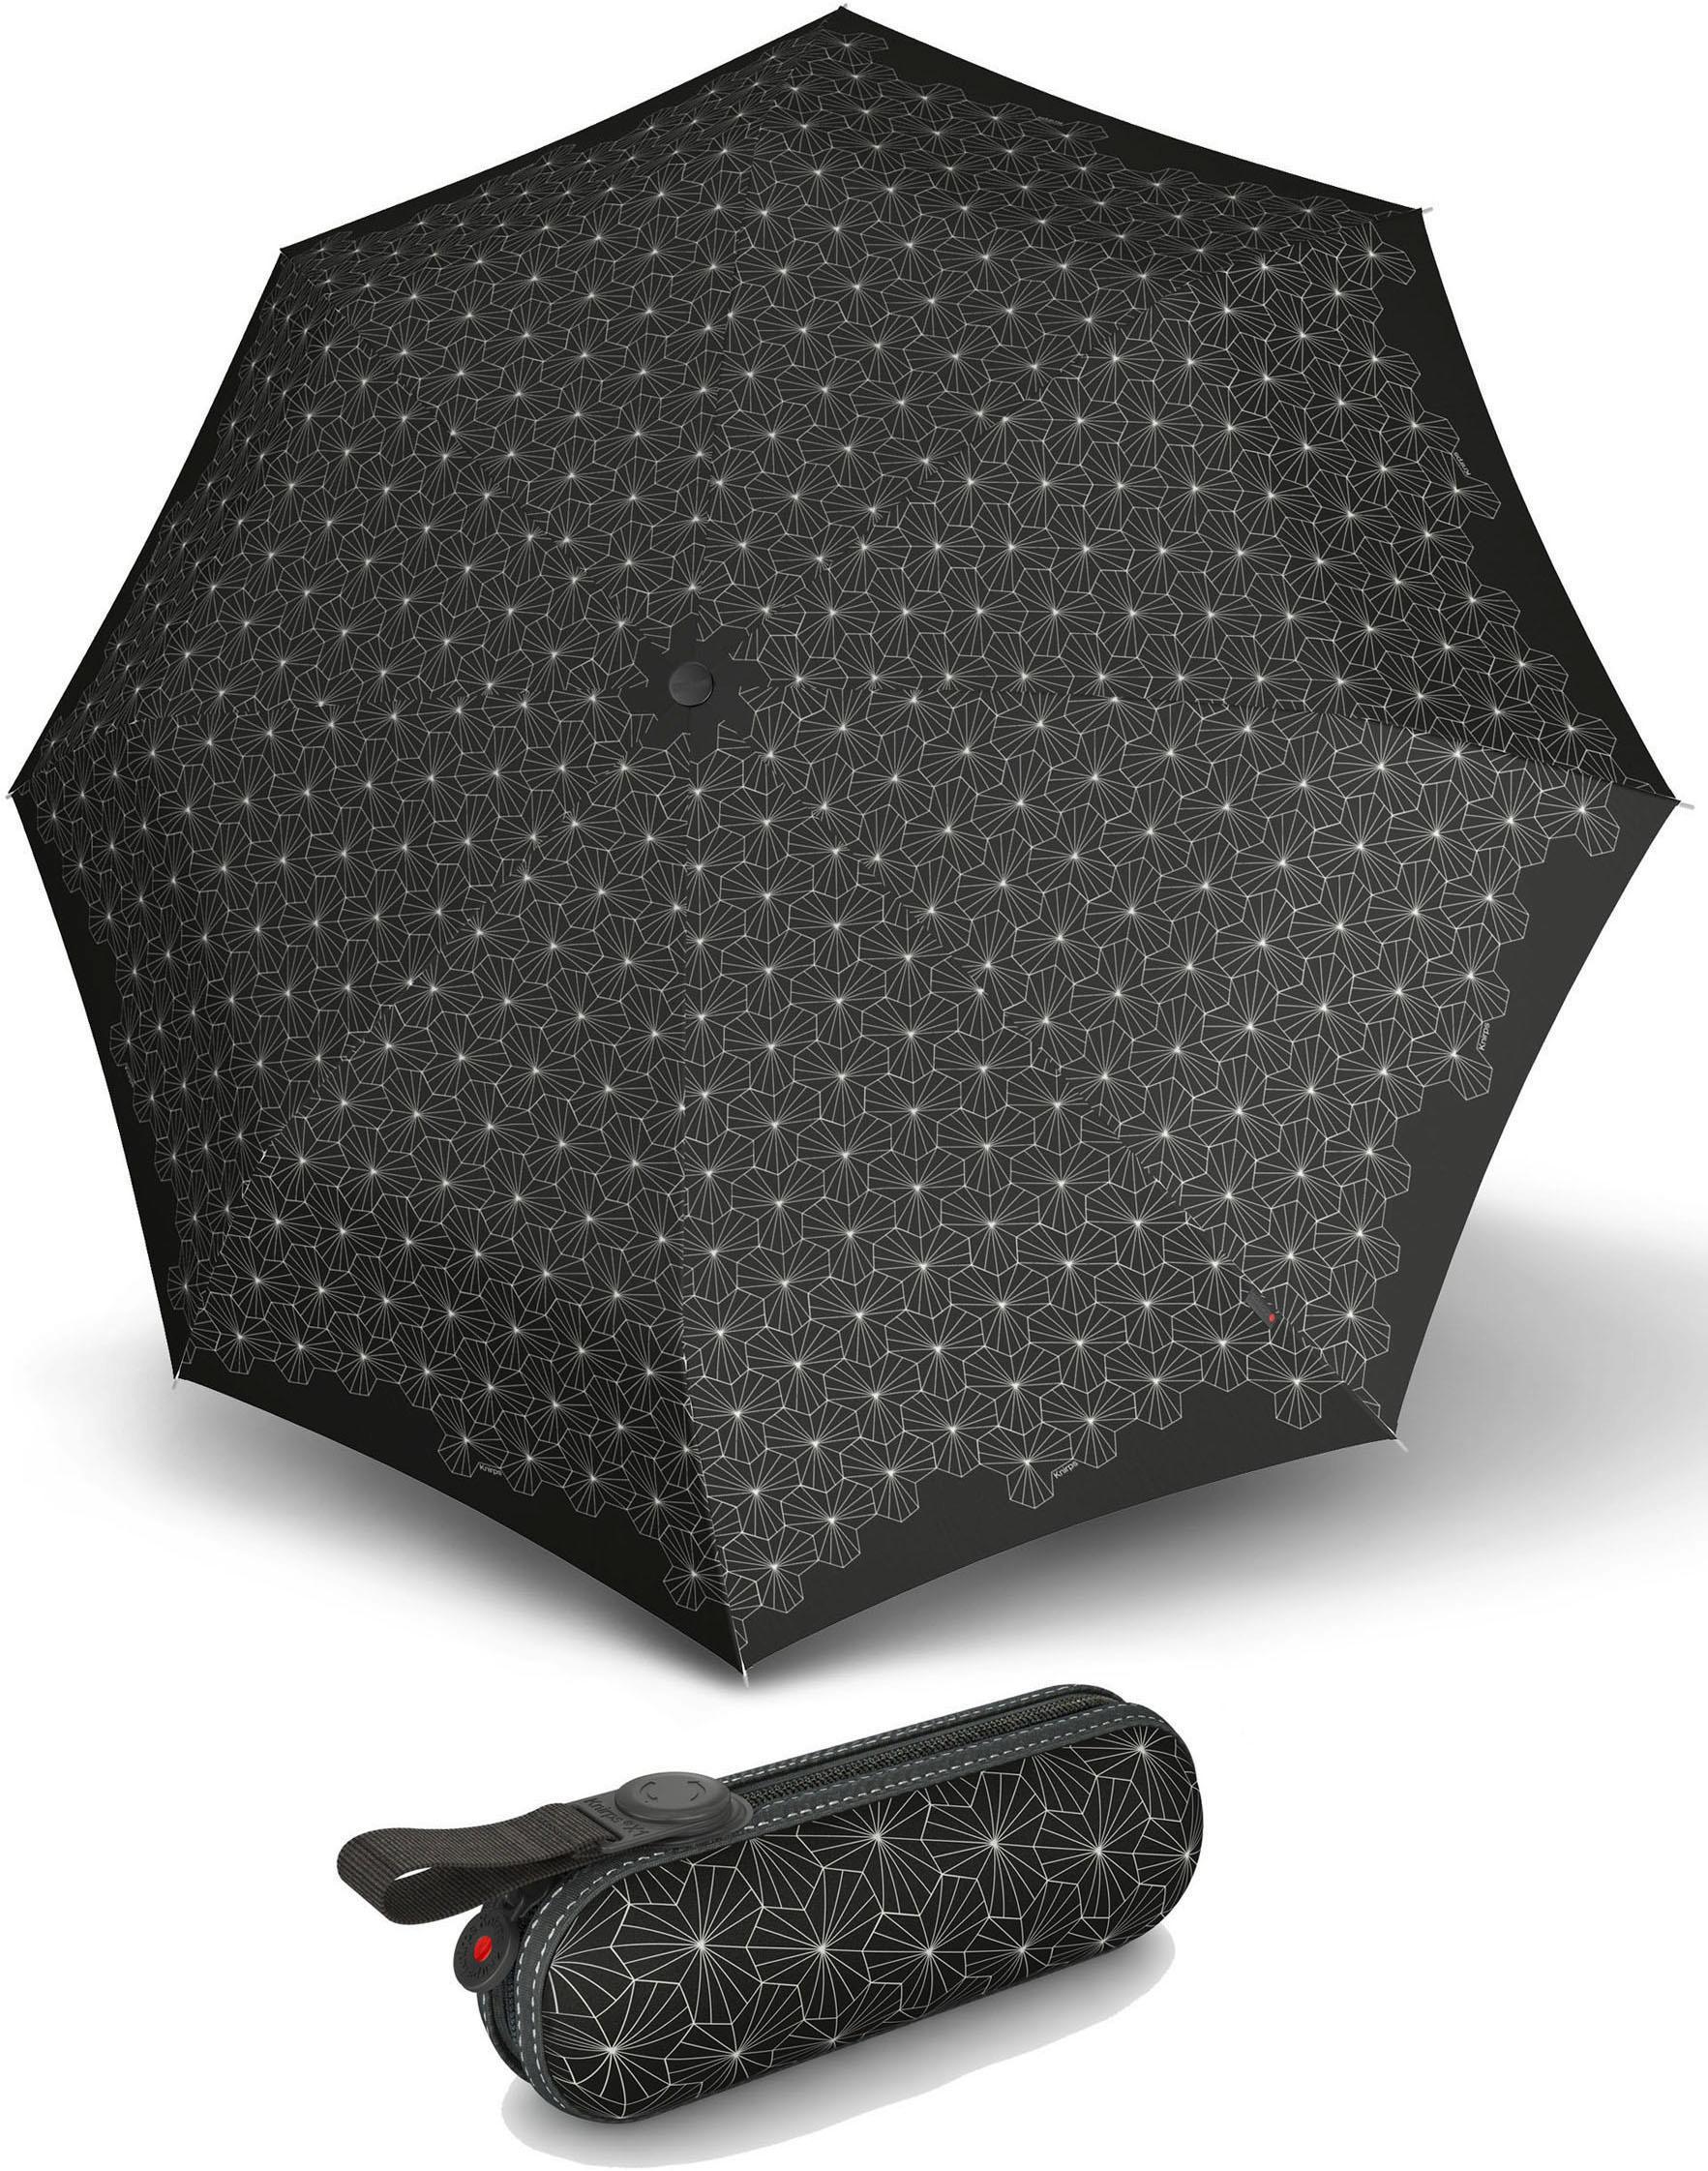 Knirps® Regenschirm - Taschenschirm, »X1 lotus black« | Accessoires > Regenschirme > Taschenschirme | knirps